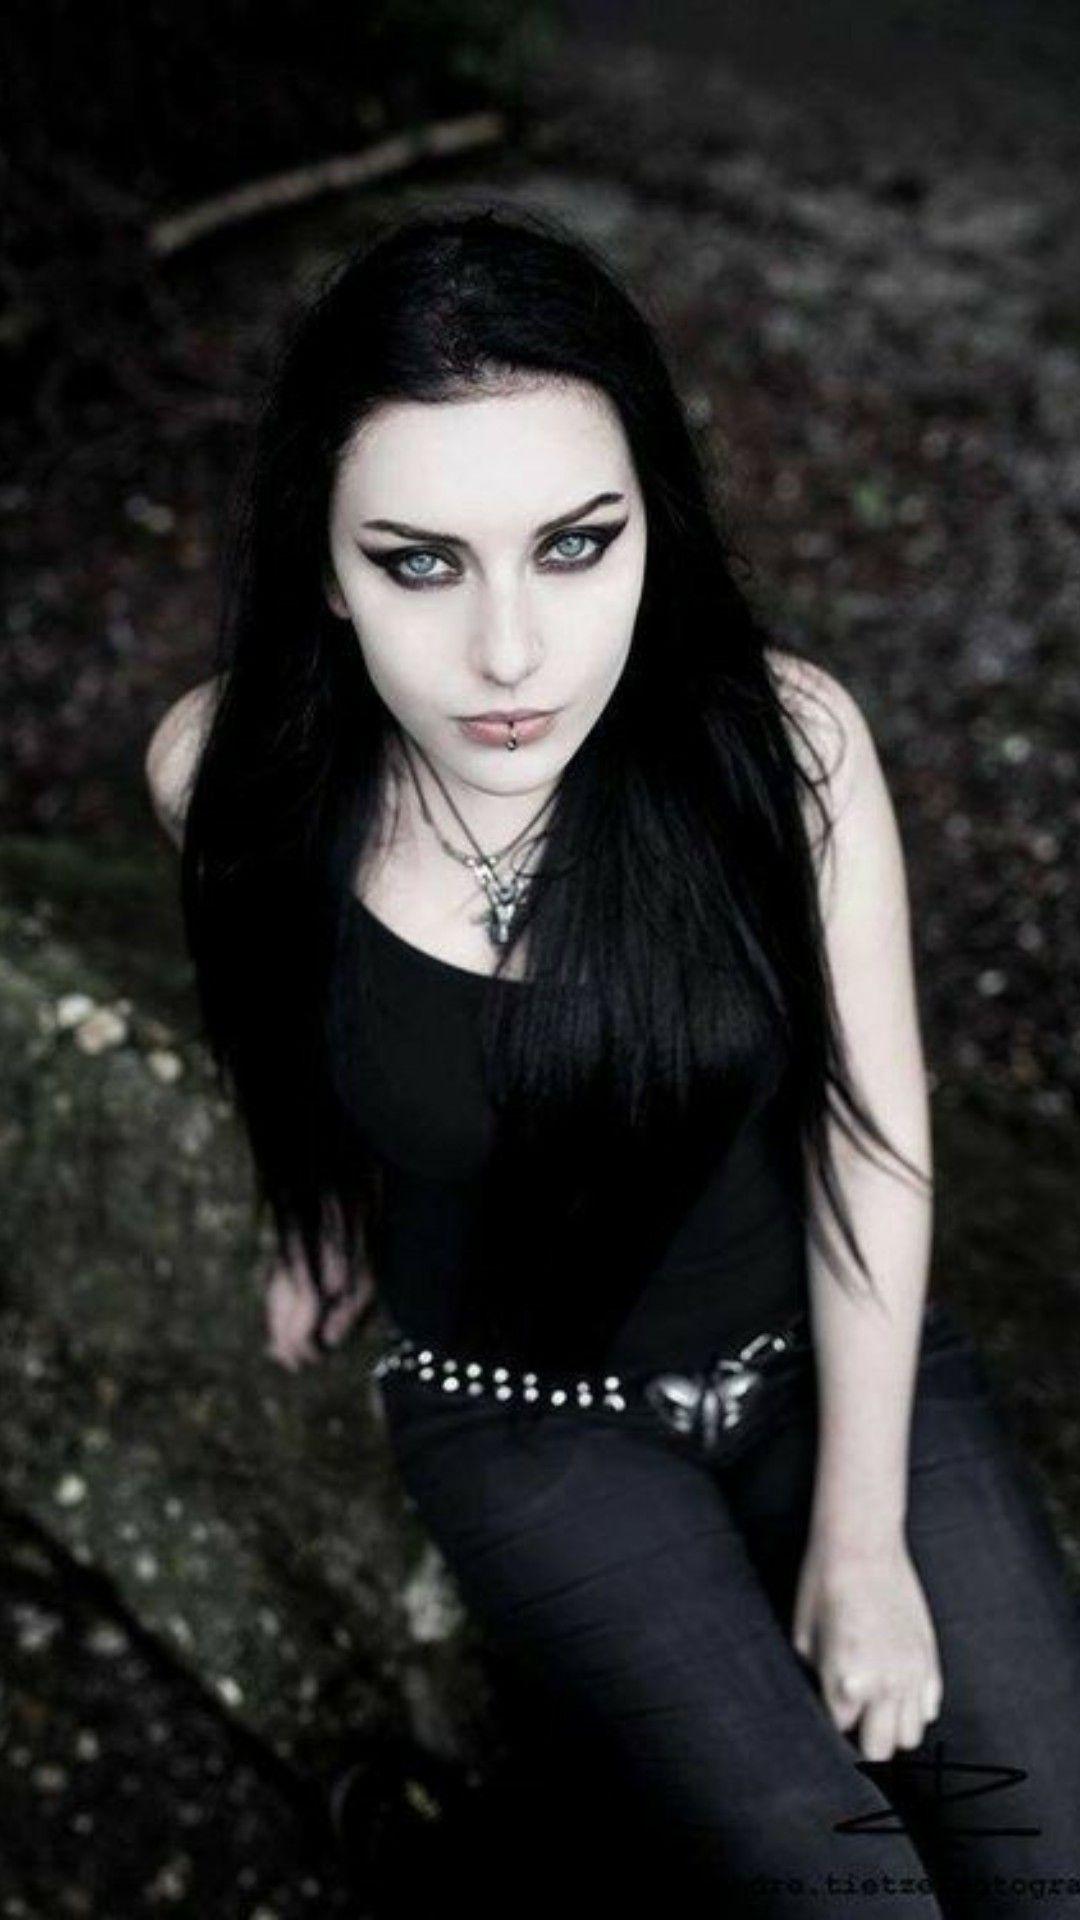 Chicas goticas sexis [PUNIQRANDLINE-(au-dating-names.txt) 57